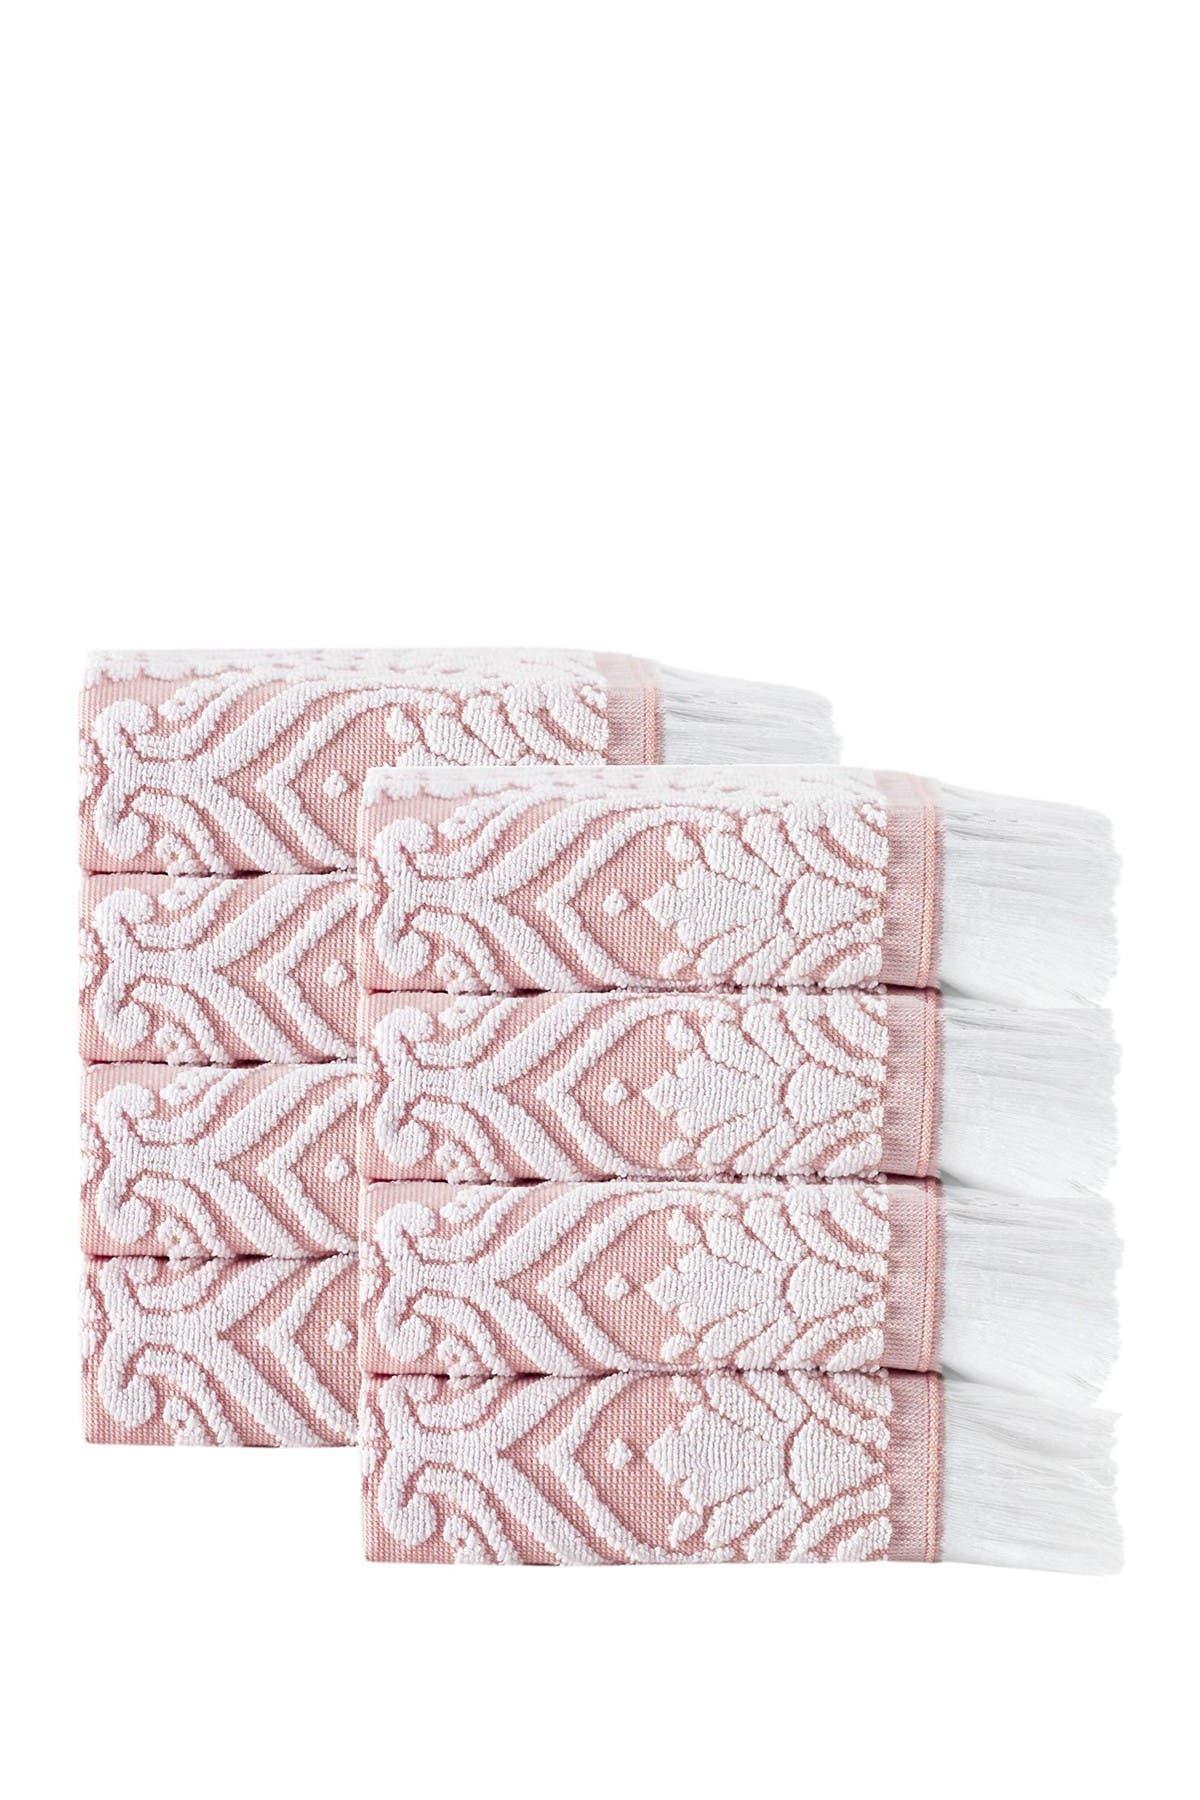 Image of ENCHANTE HOME Laina Turkish Cotton Pink Wash Towels - Set of 8